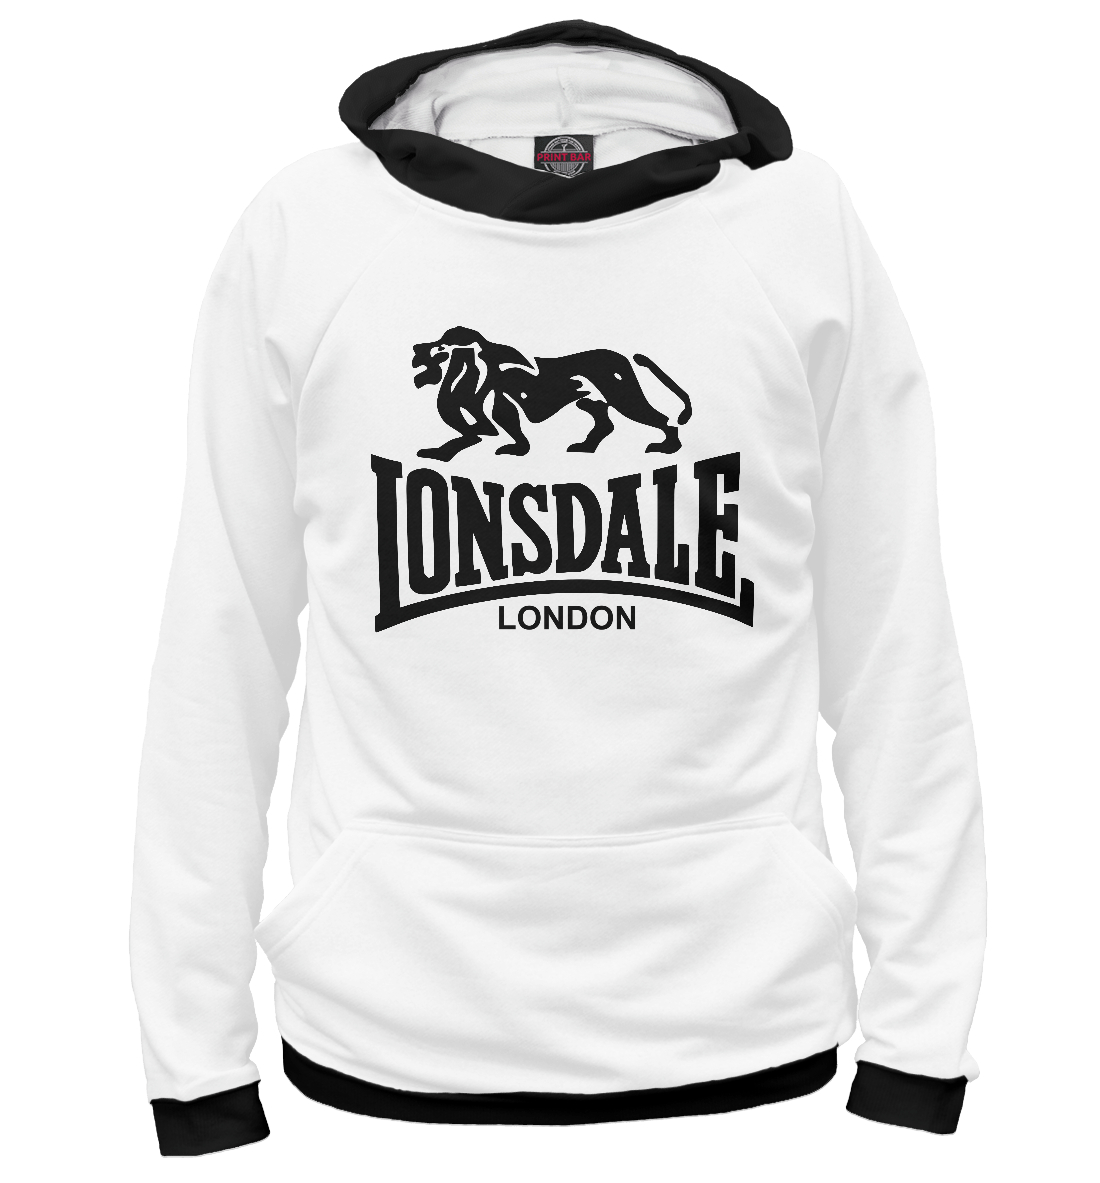 Купить Lonsdale London, Printbar, Худи, APD-372878-hud-1